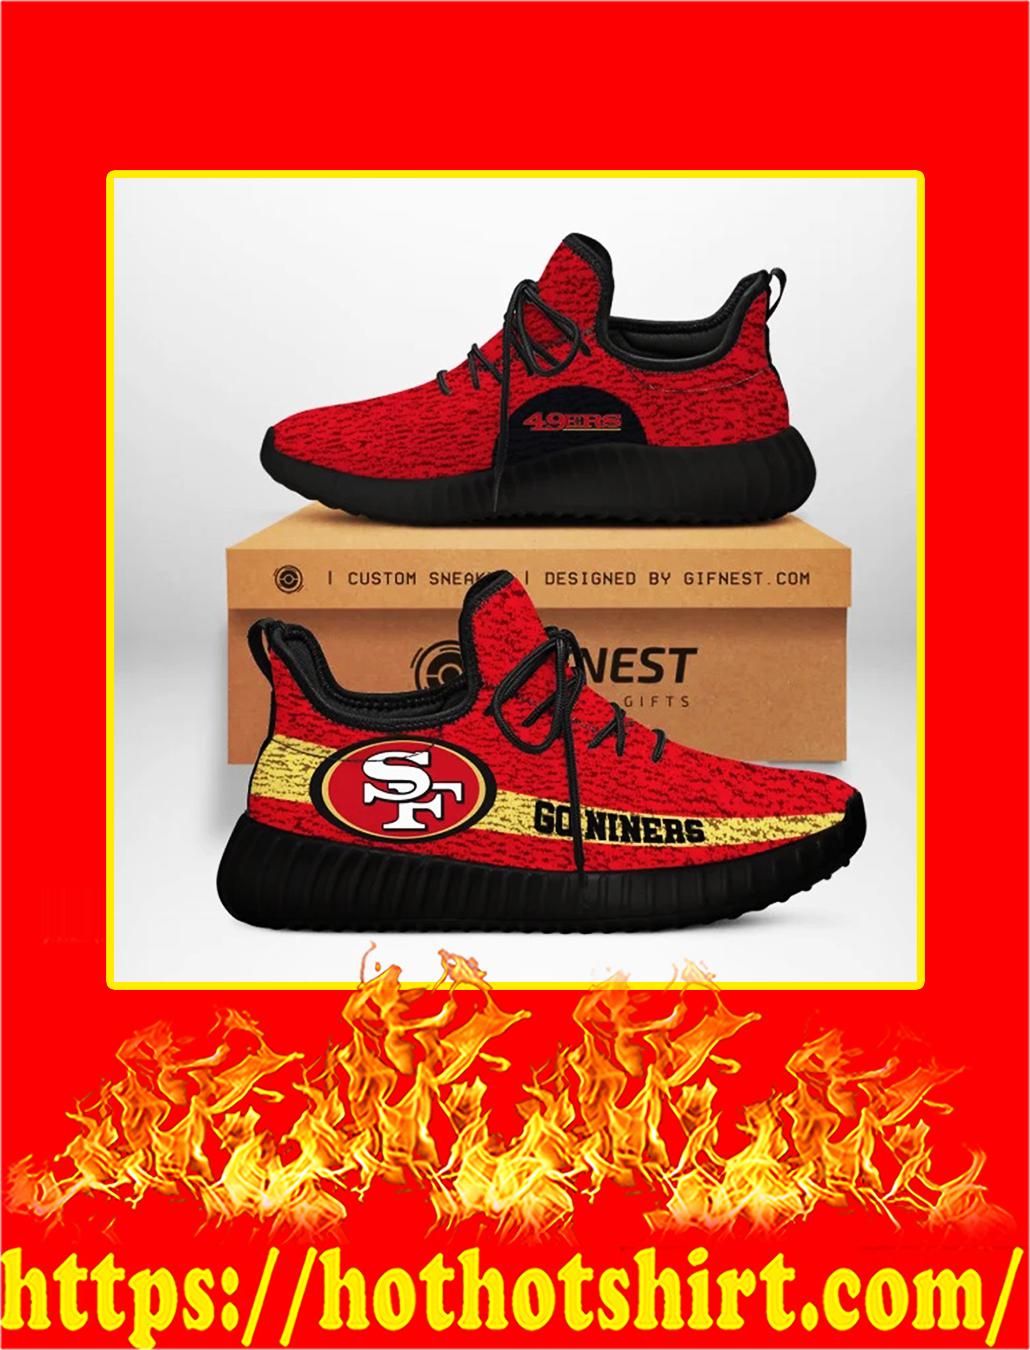 Go Niners San Francisco 49ers NFL Yeezy Sneaker- white